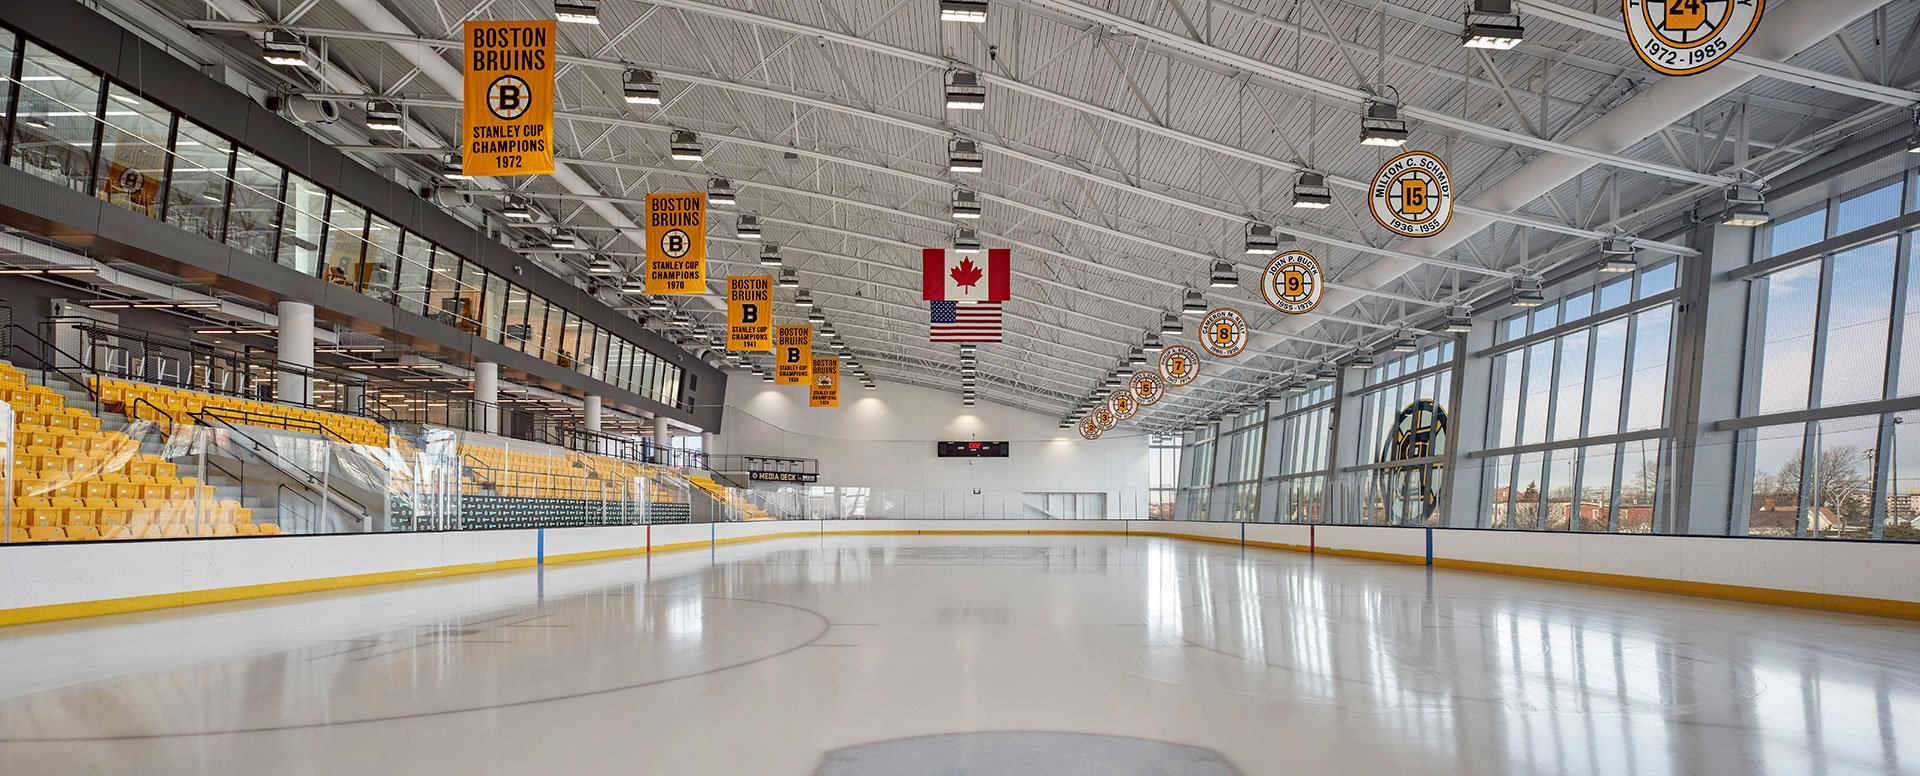 Warrior Ice Arena, Brighton, MA